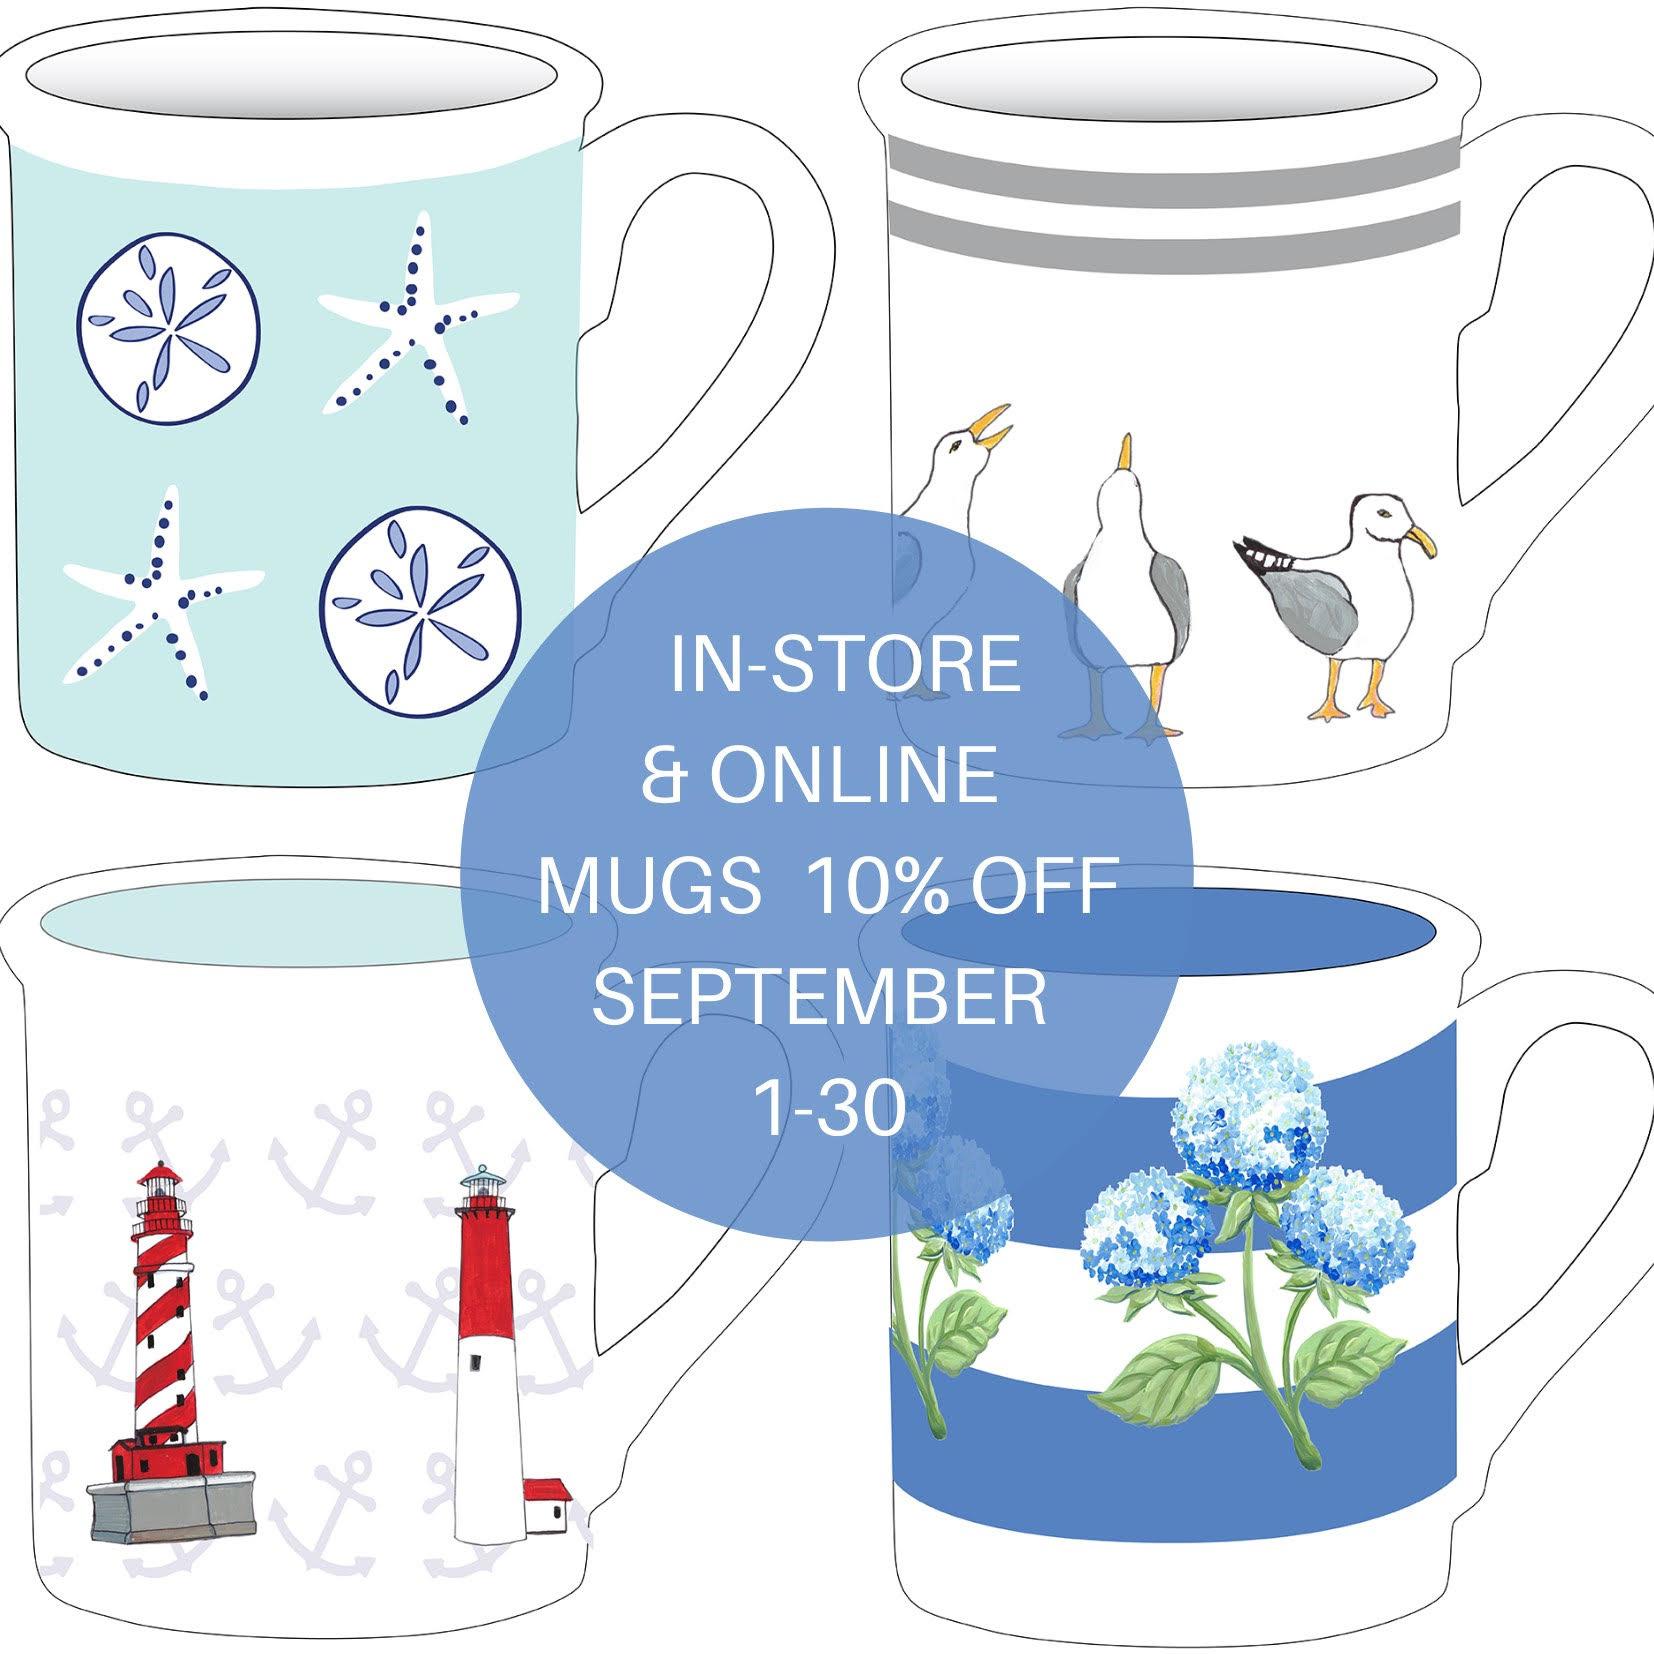 Mugs - USE CODE MUG10 for 10% Off